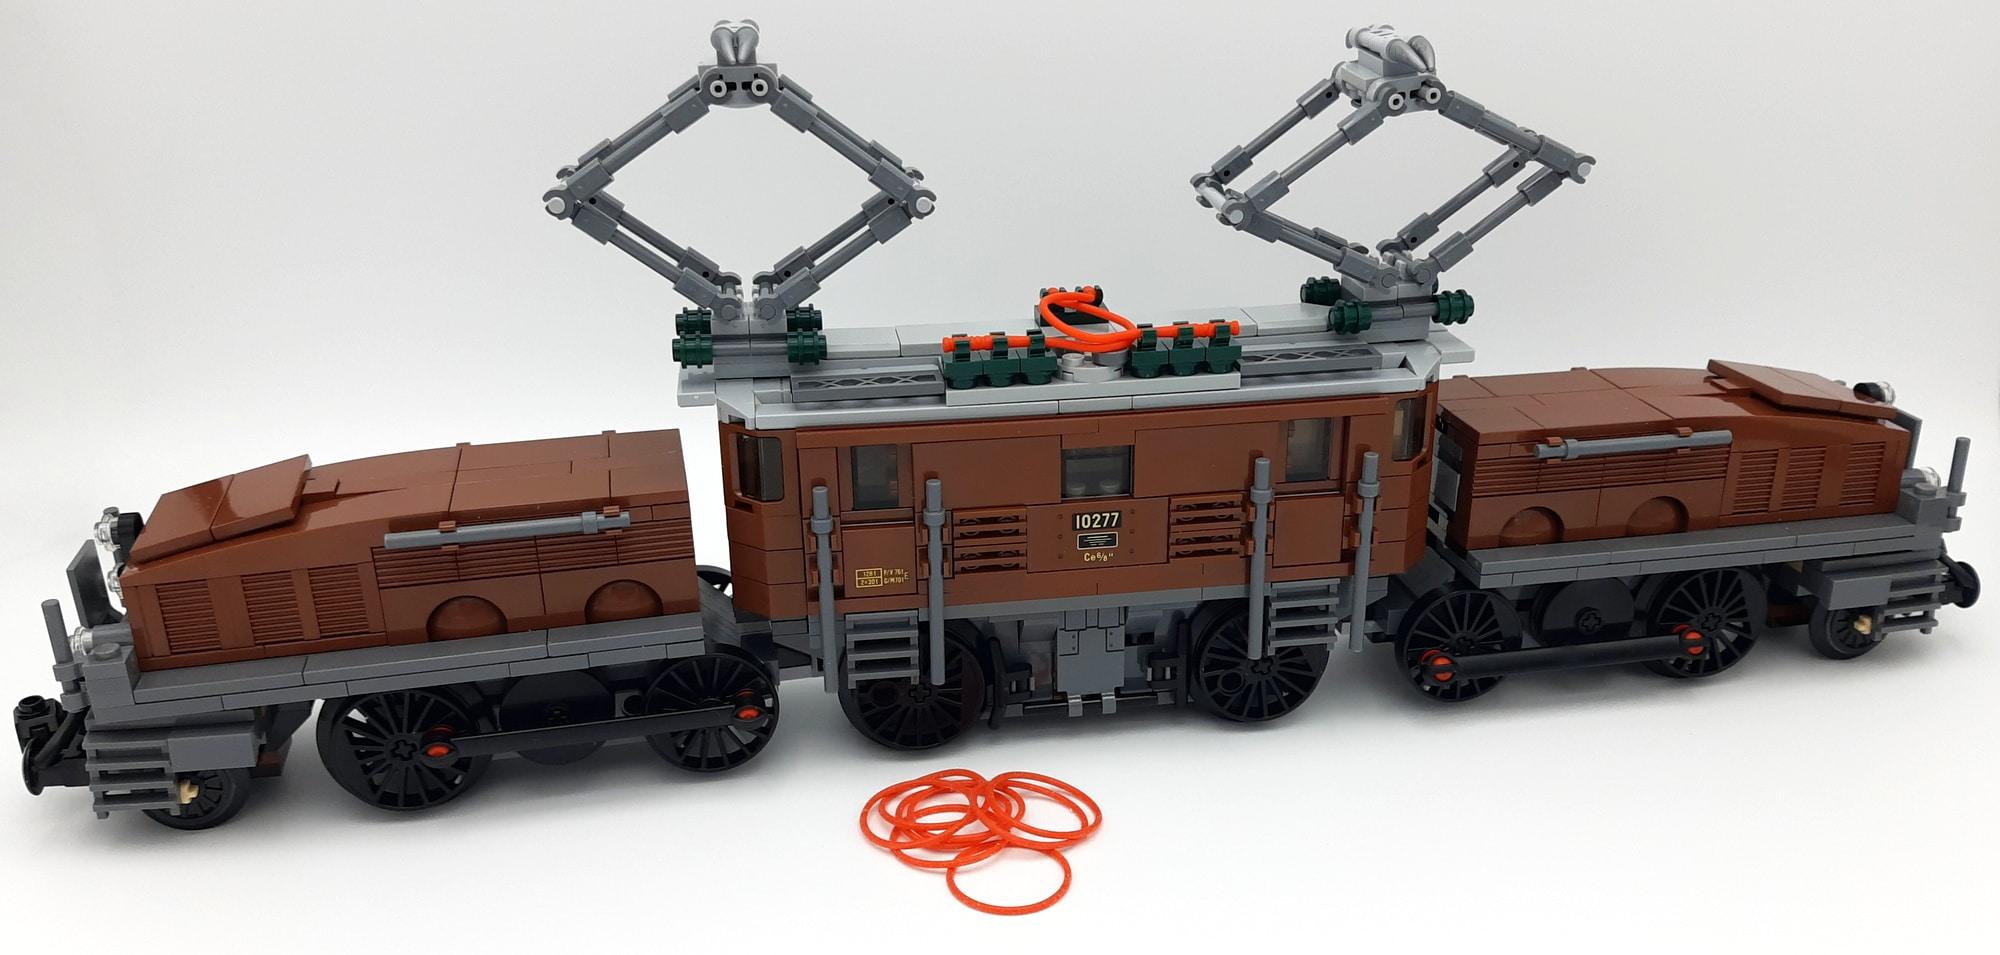 LEGO 10277 Krokodil Lokomotive - Ohne Gummiringe